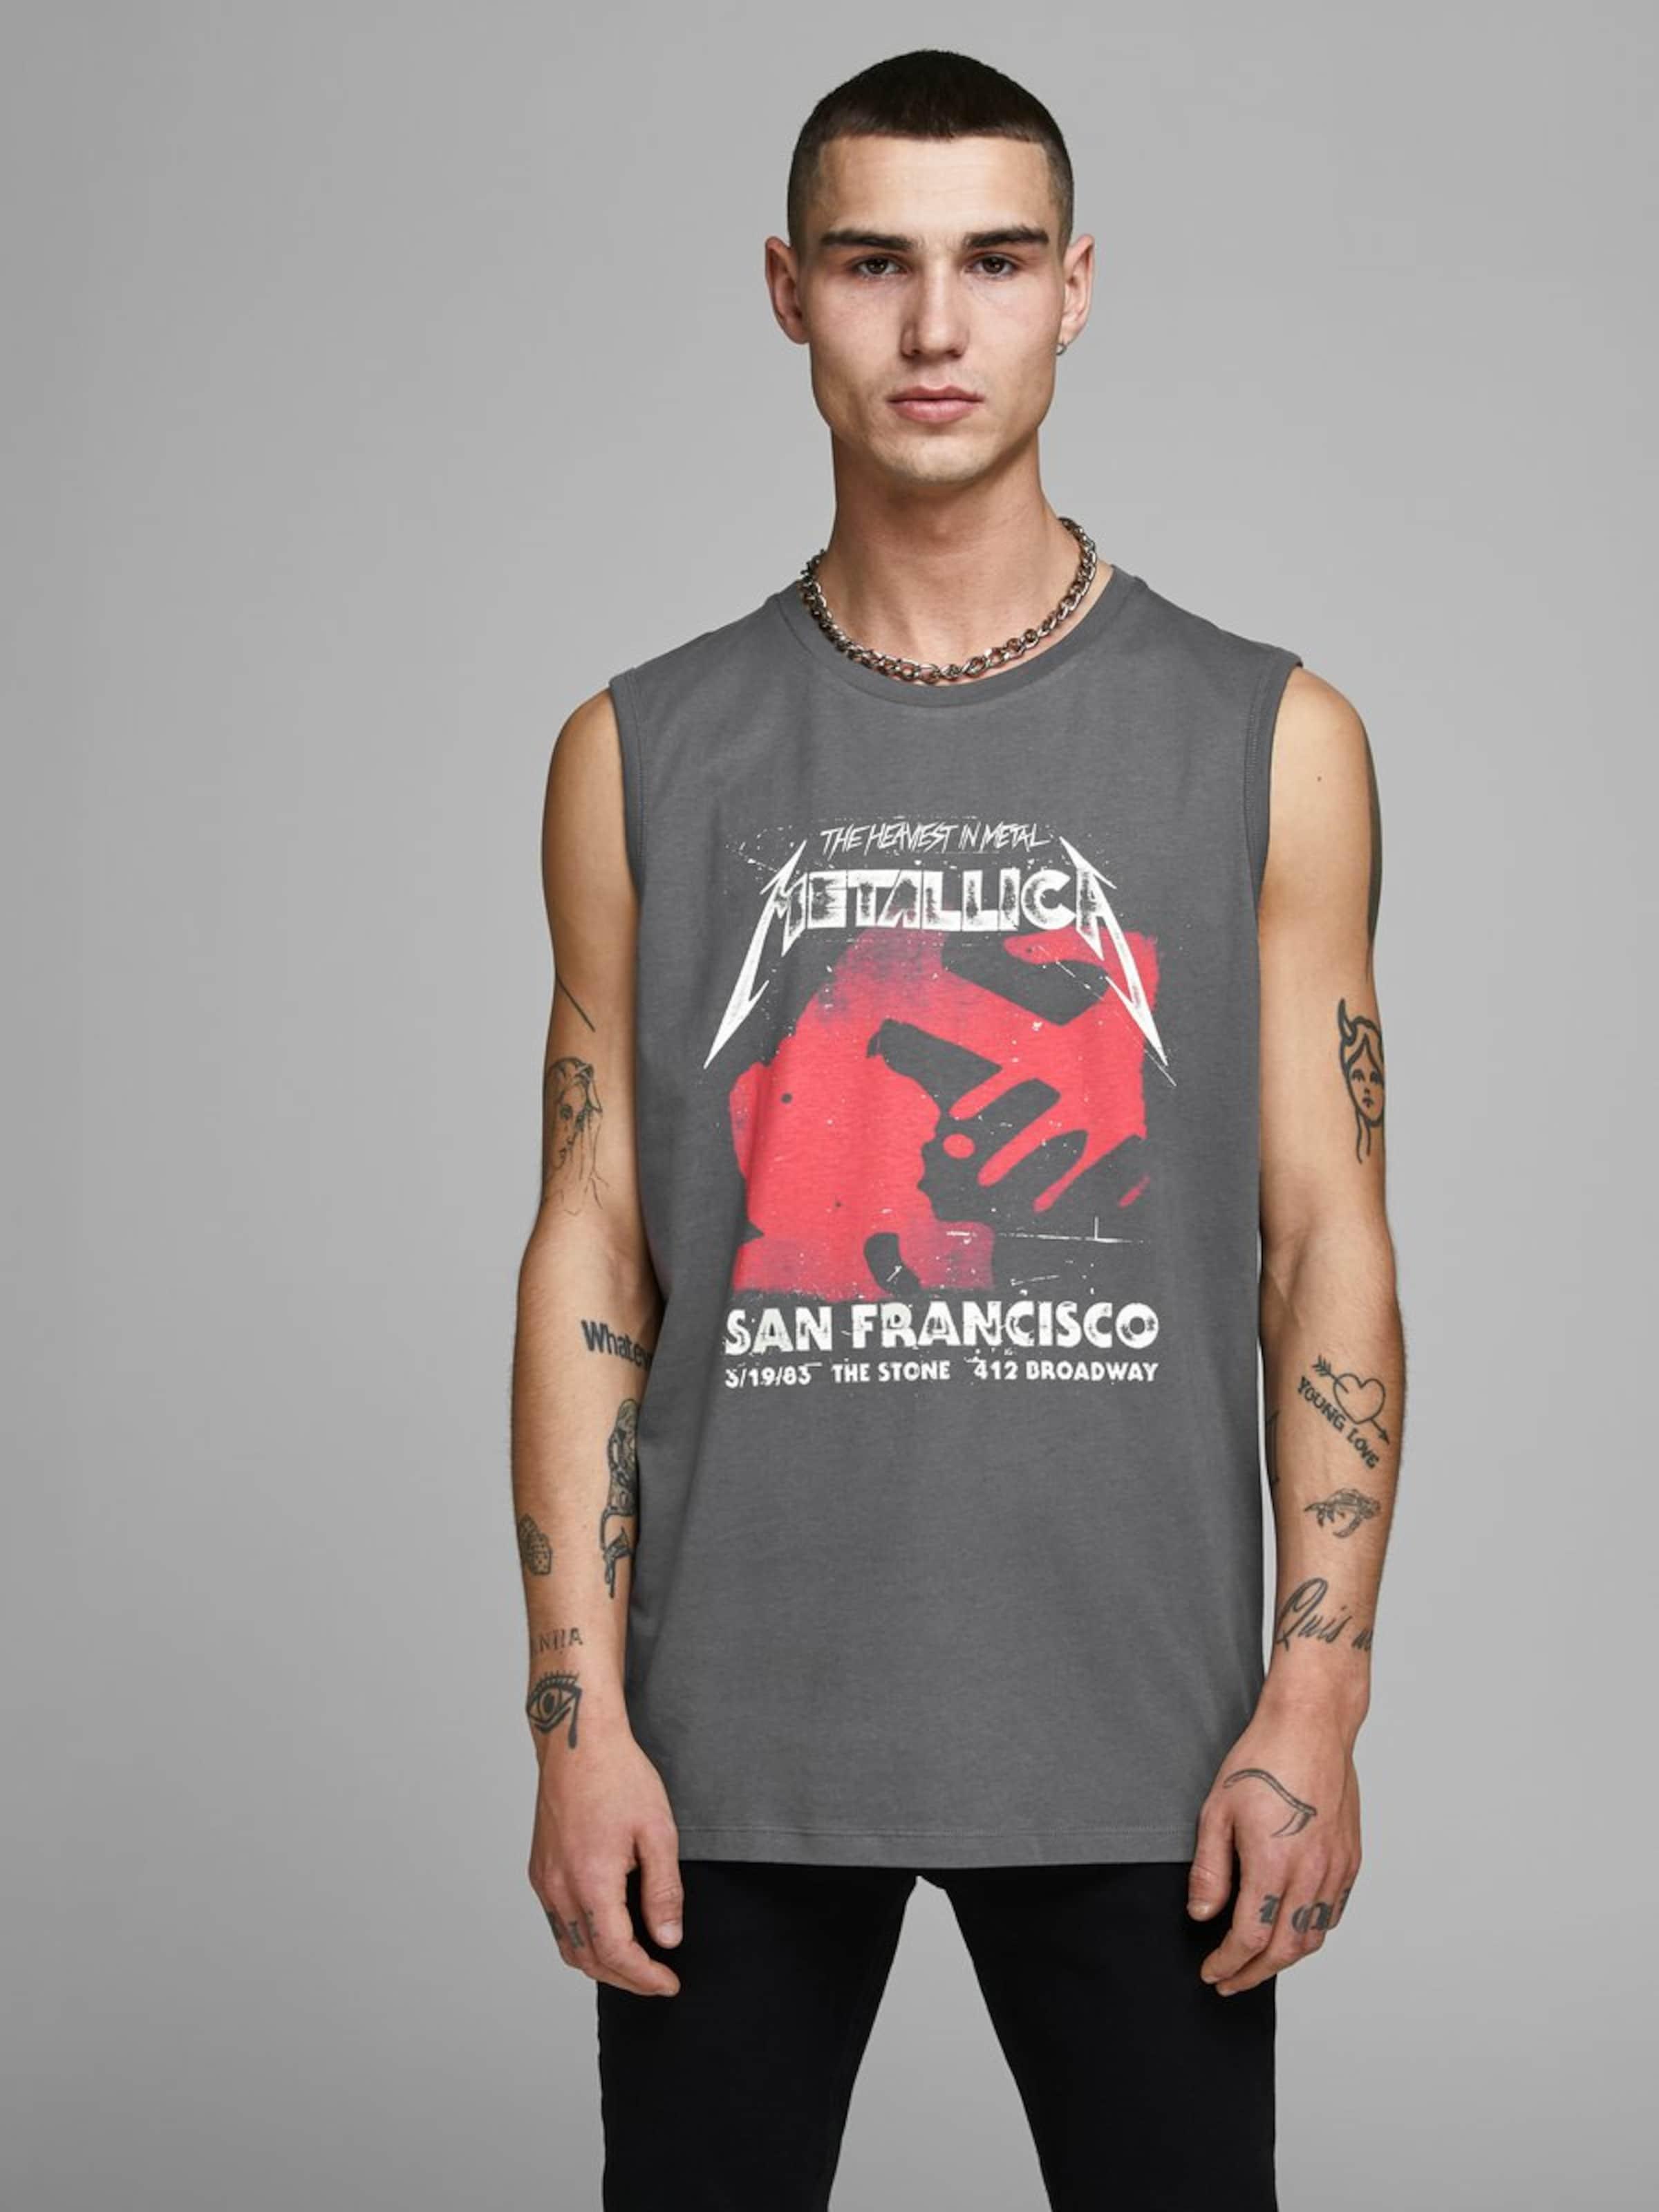 Jones En Jackamp; Gris T shirt Foncé kZiXuP